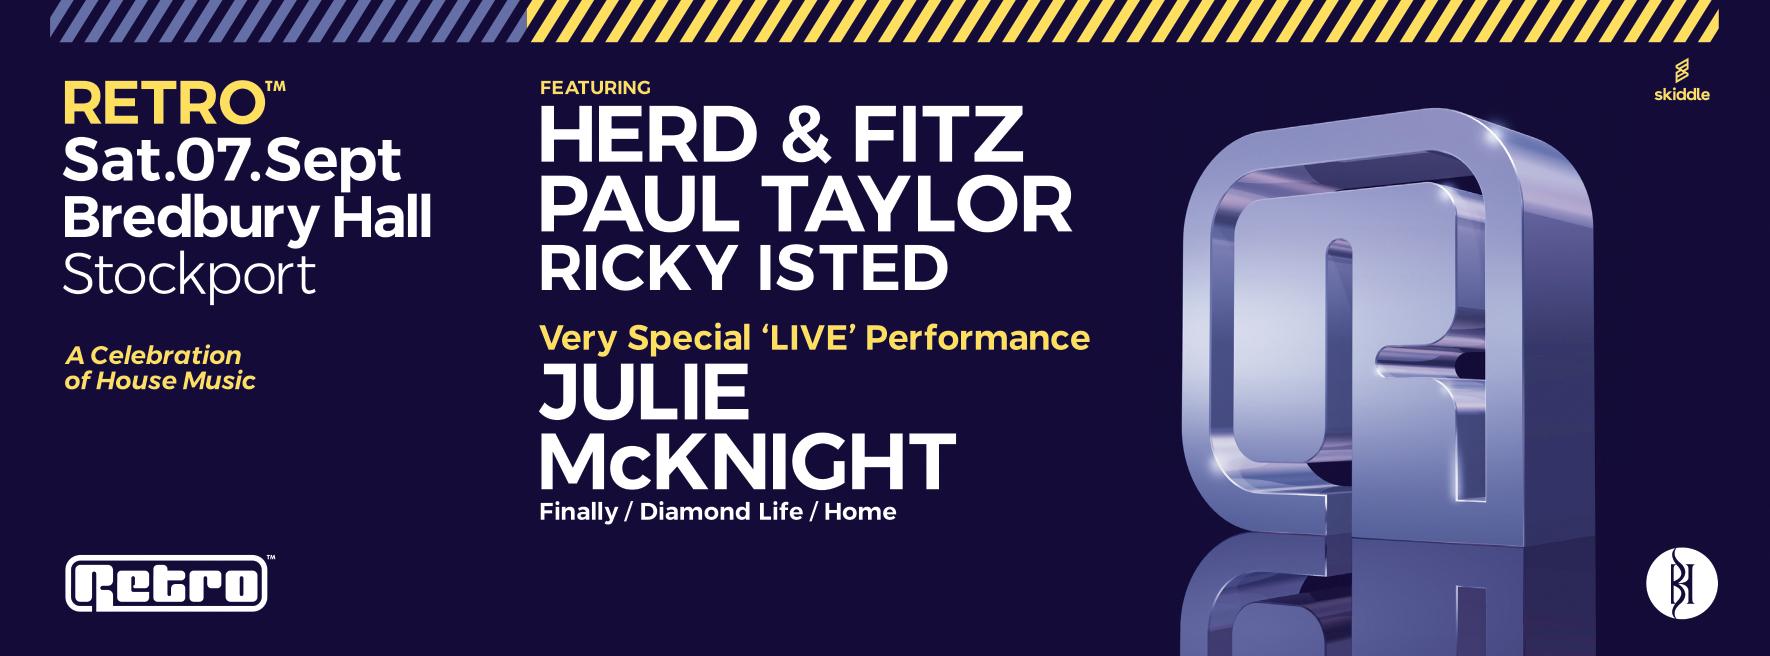 Retro at Bredbury Hall w/ Herd & Fitz & Julie McKnight live